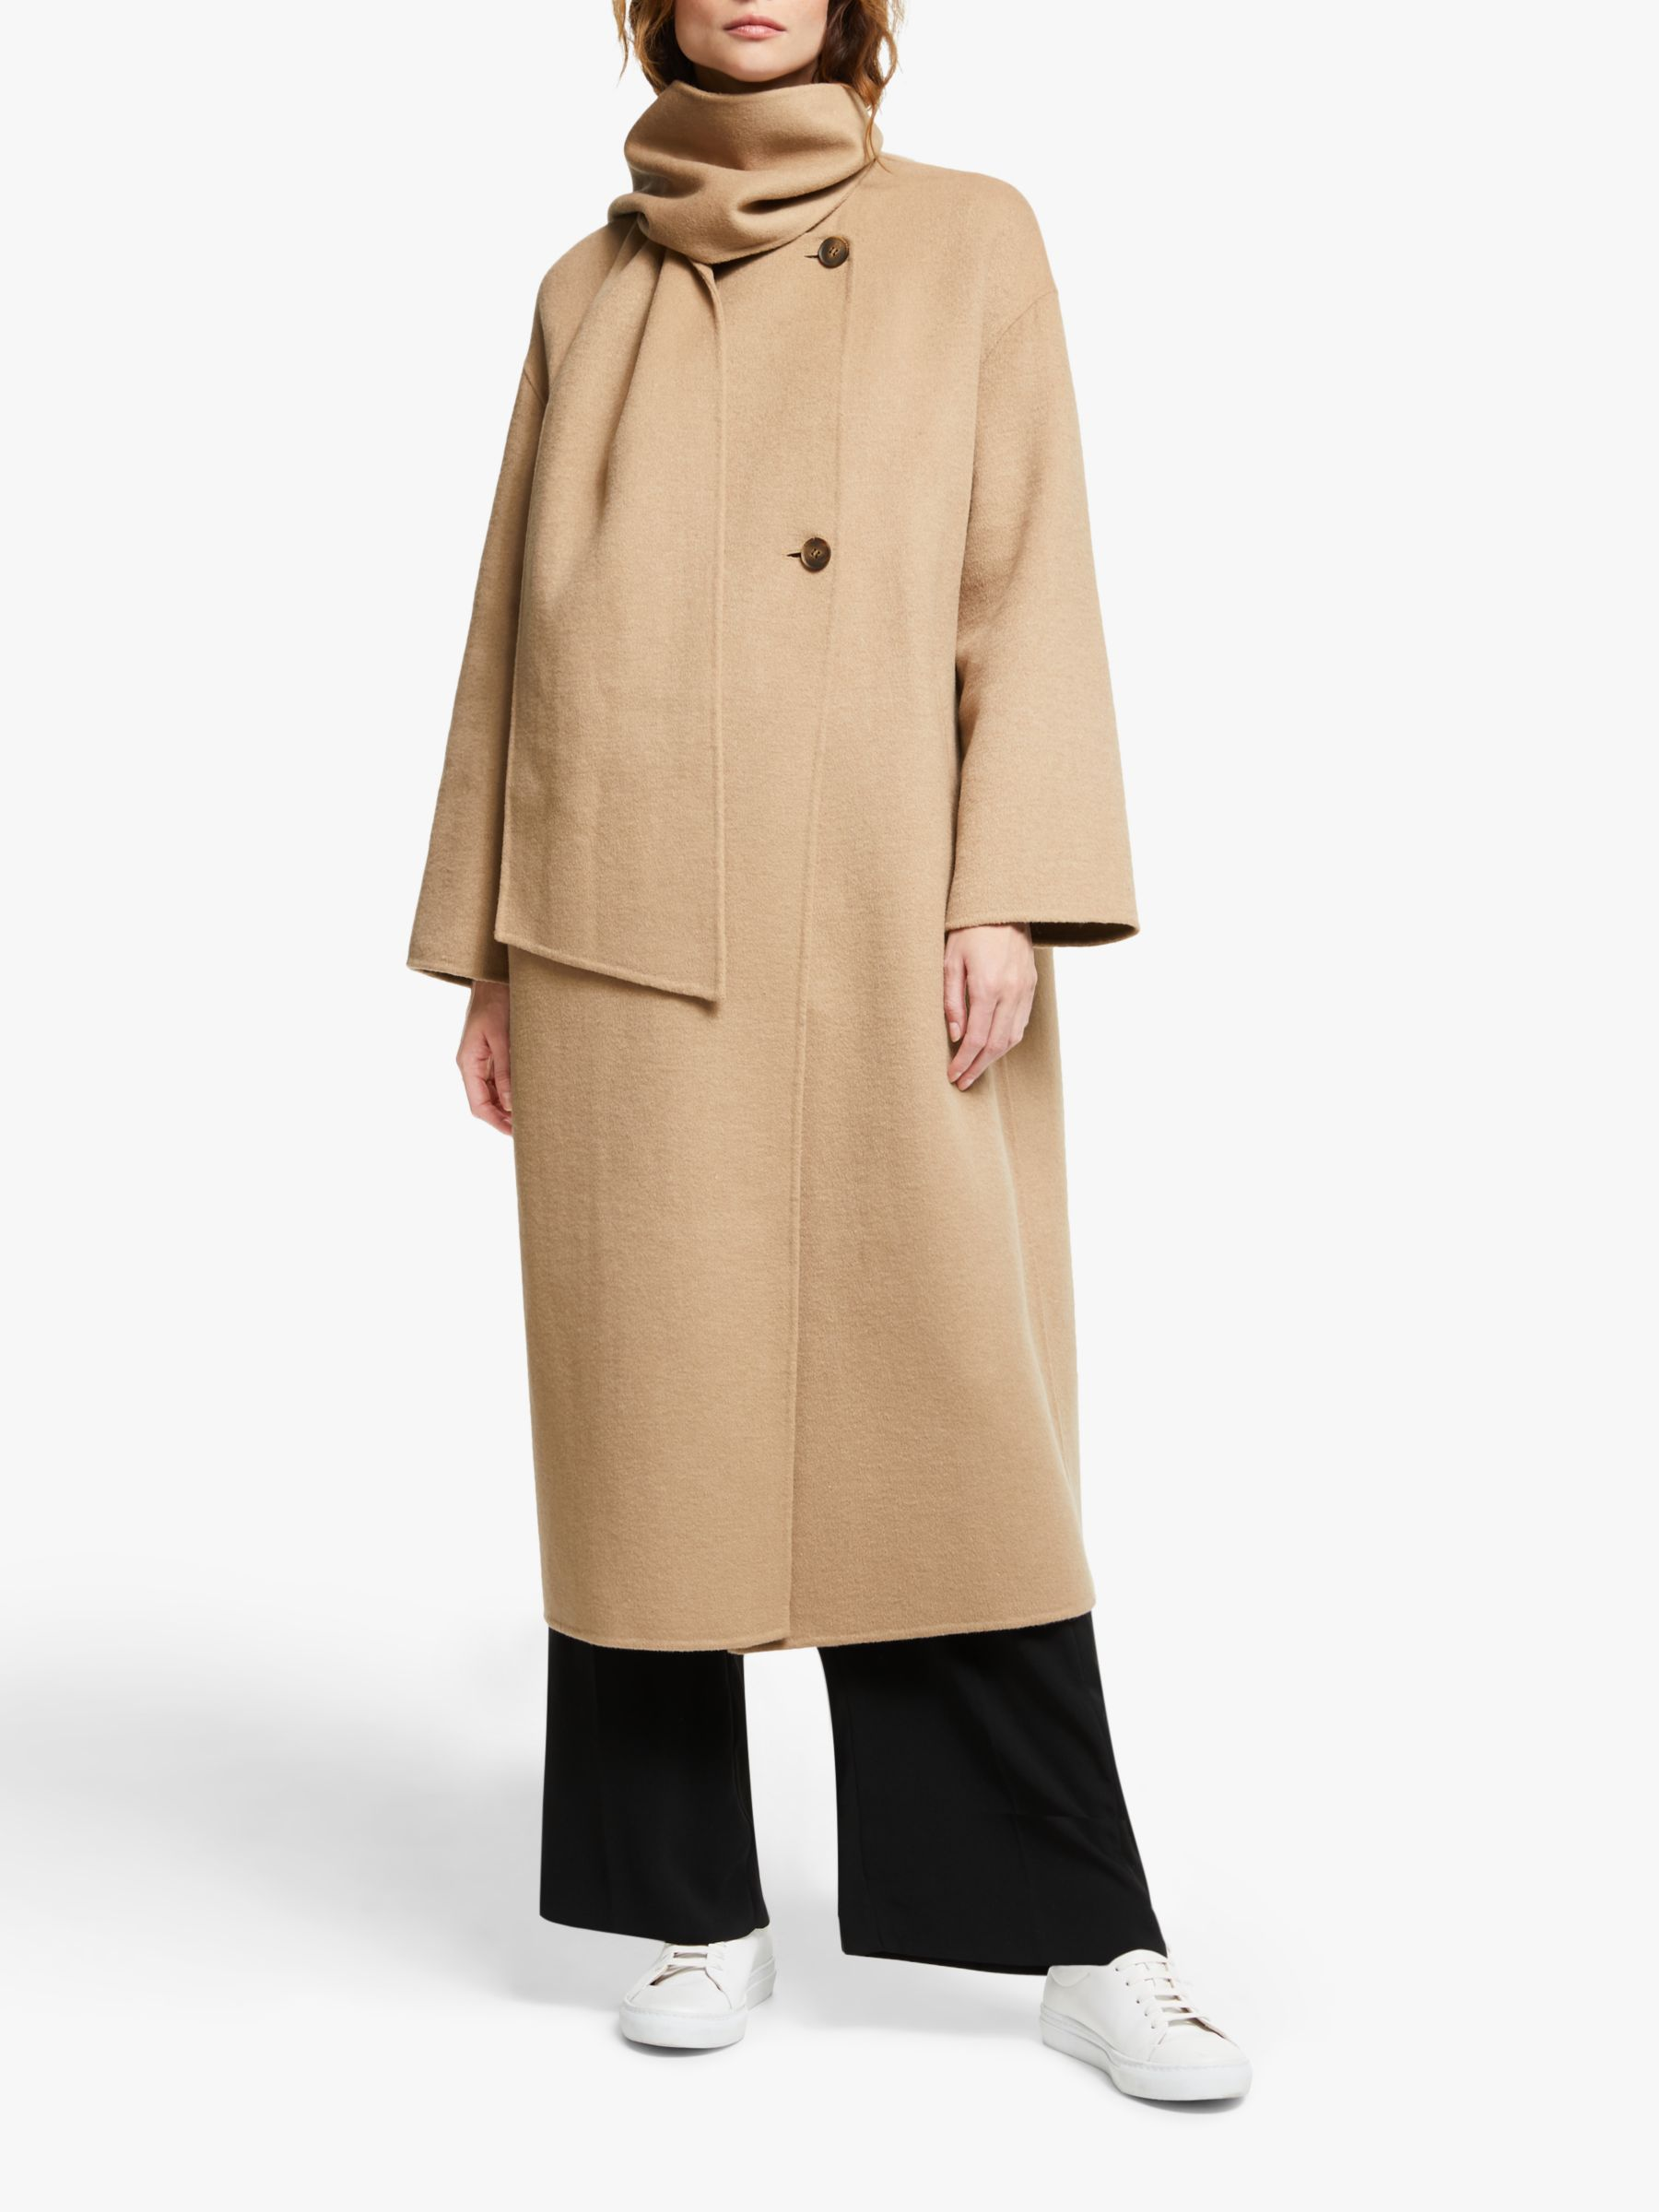 Modern Rarity Modern Rarity Collarless Double Faced Coat, Brown